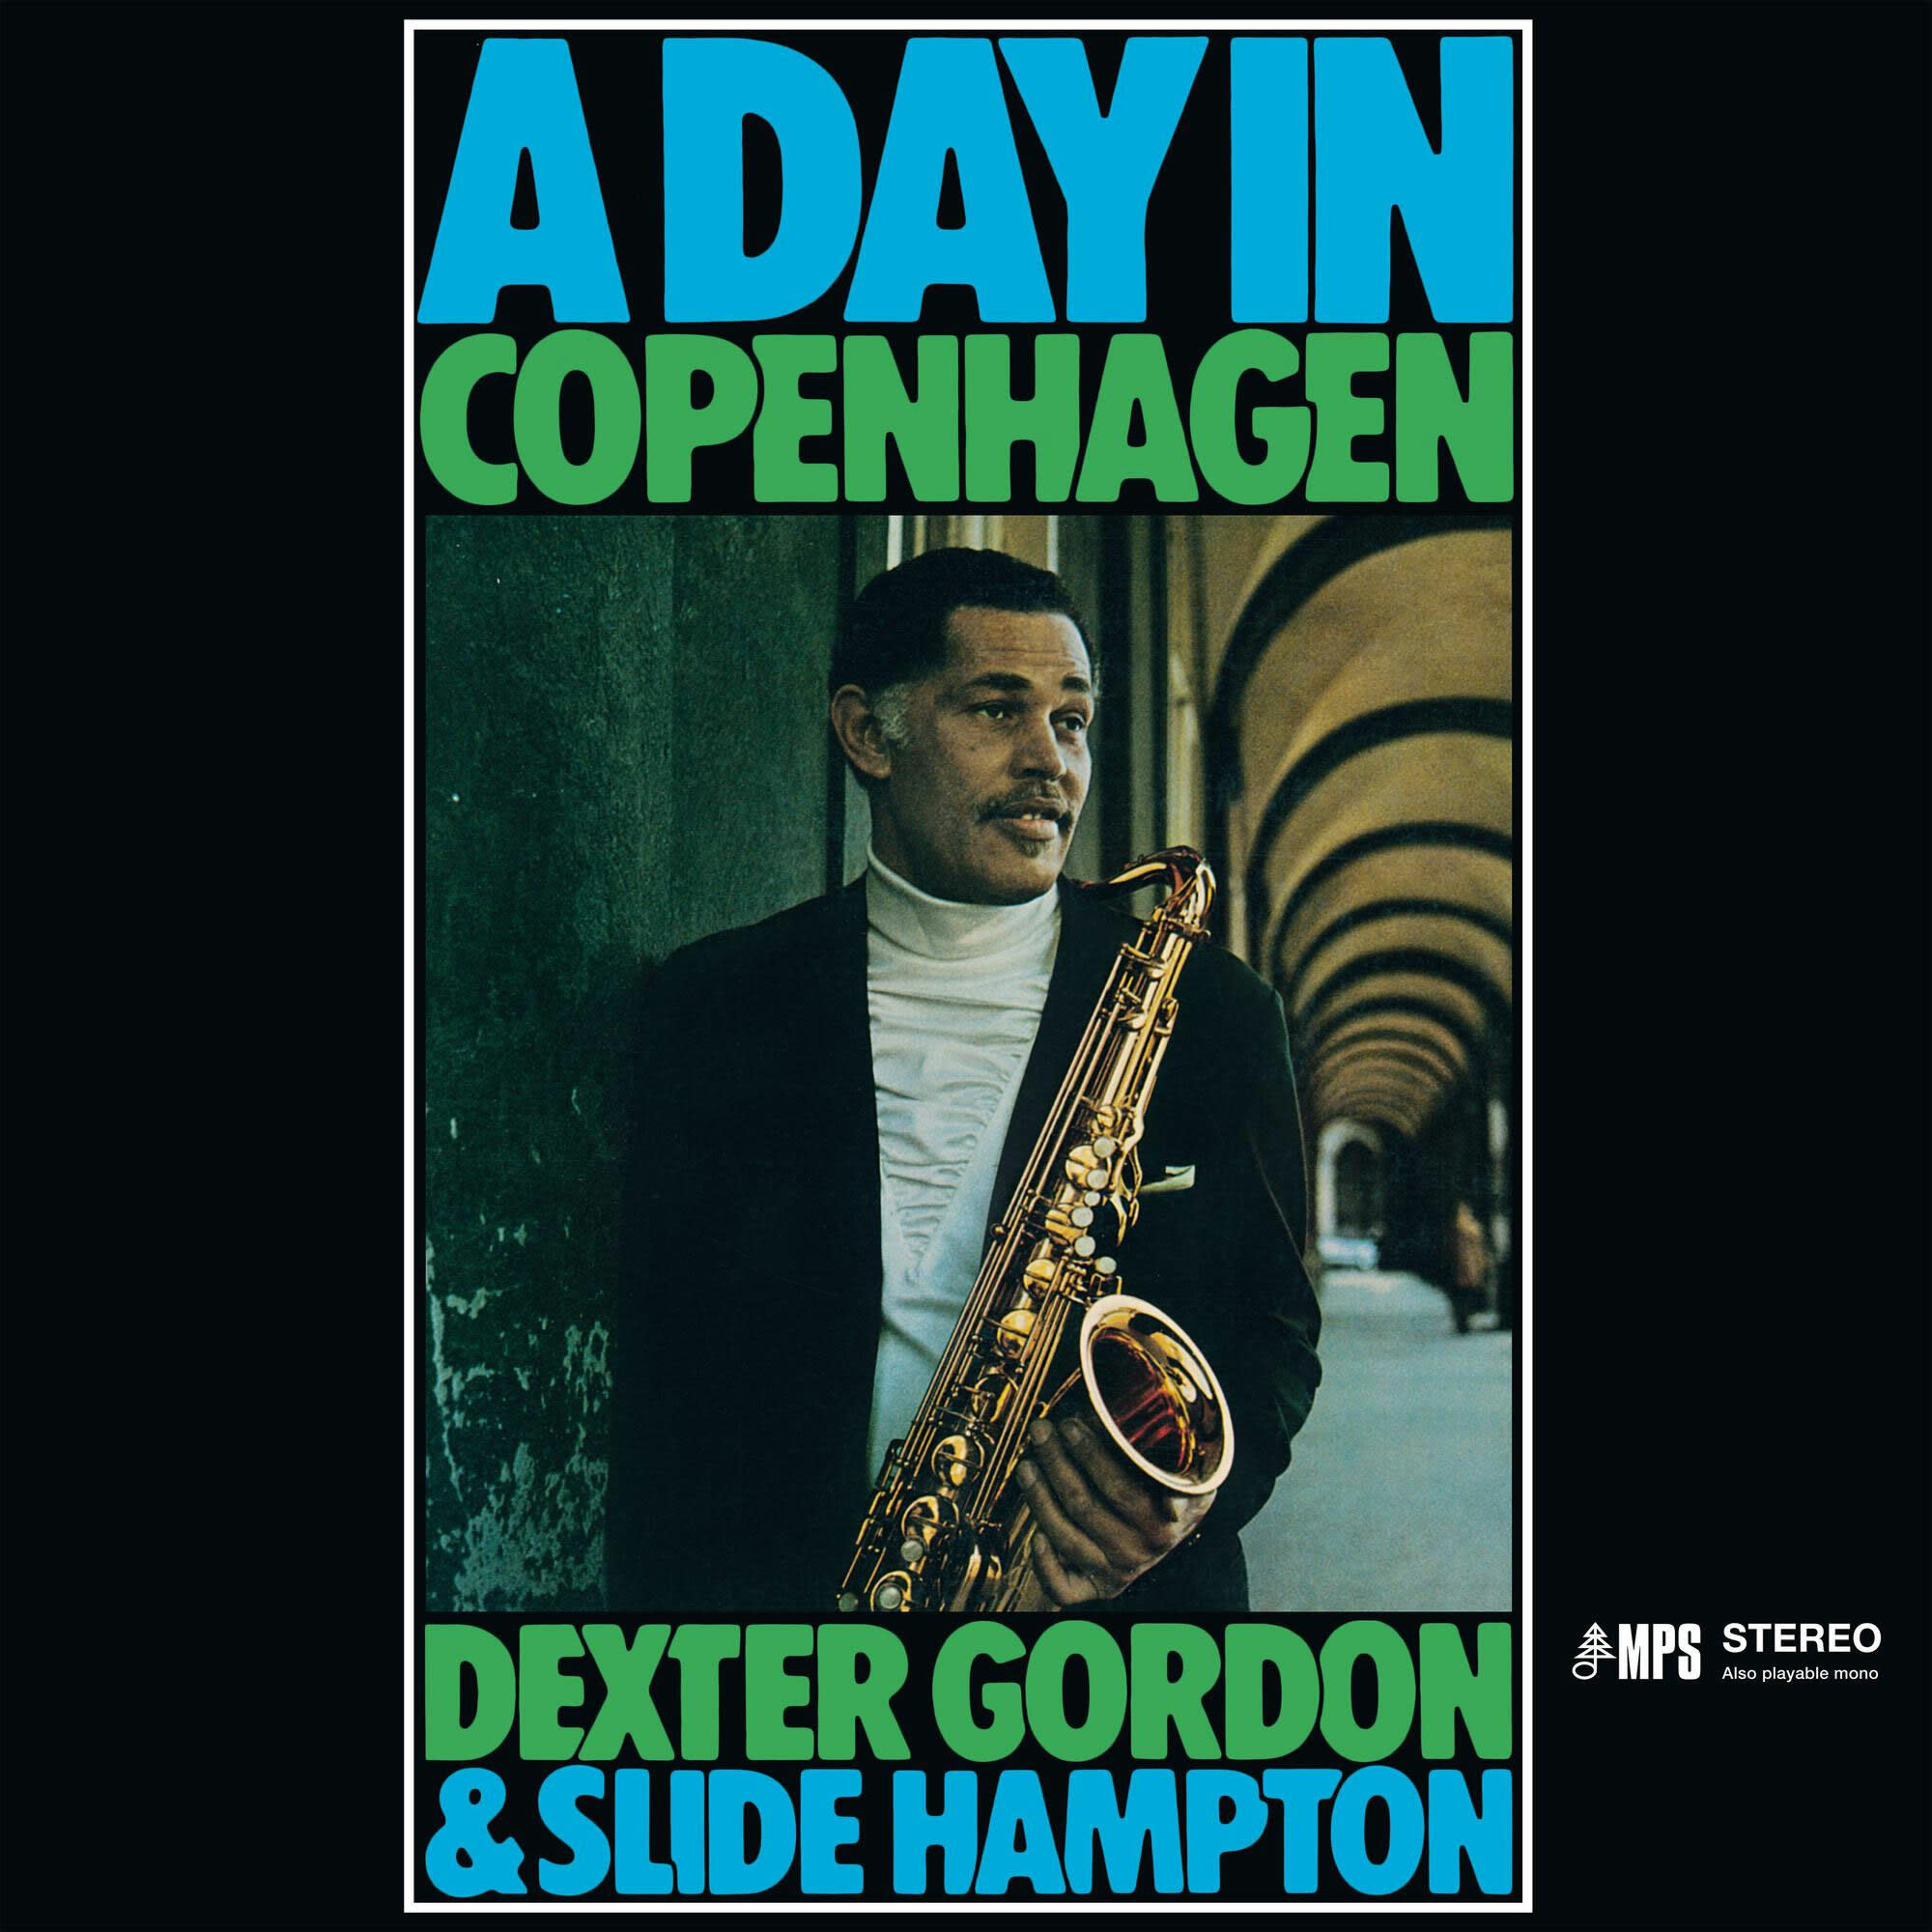 Dexter Gordon & Slide Hampton – A Day In Copenhagen